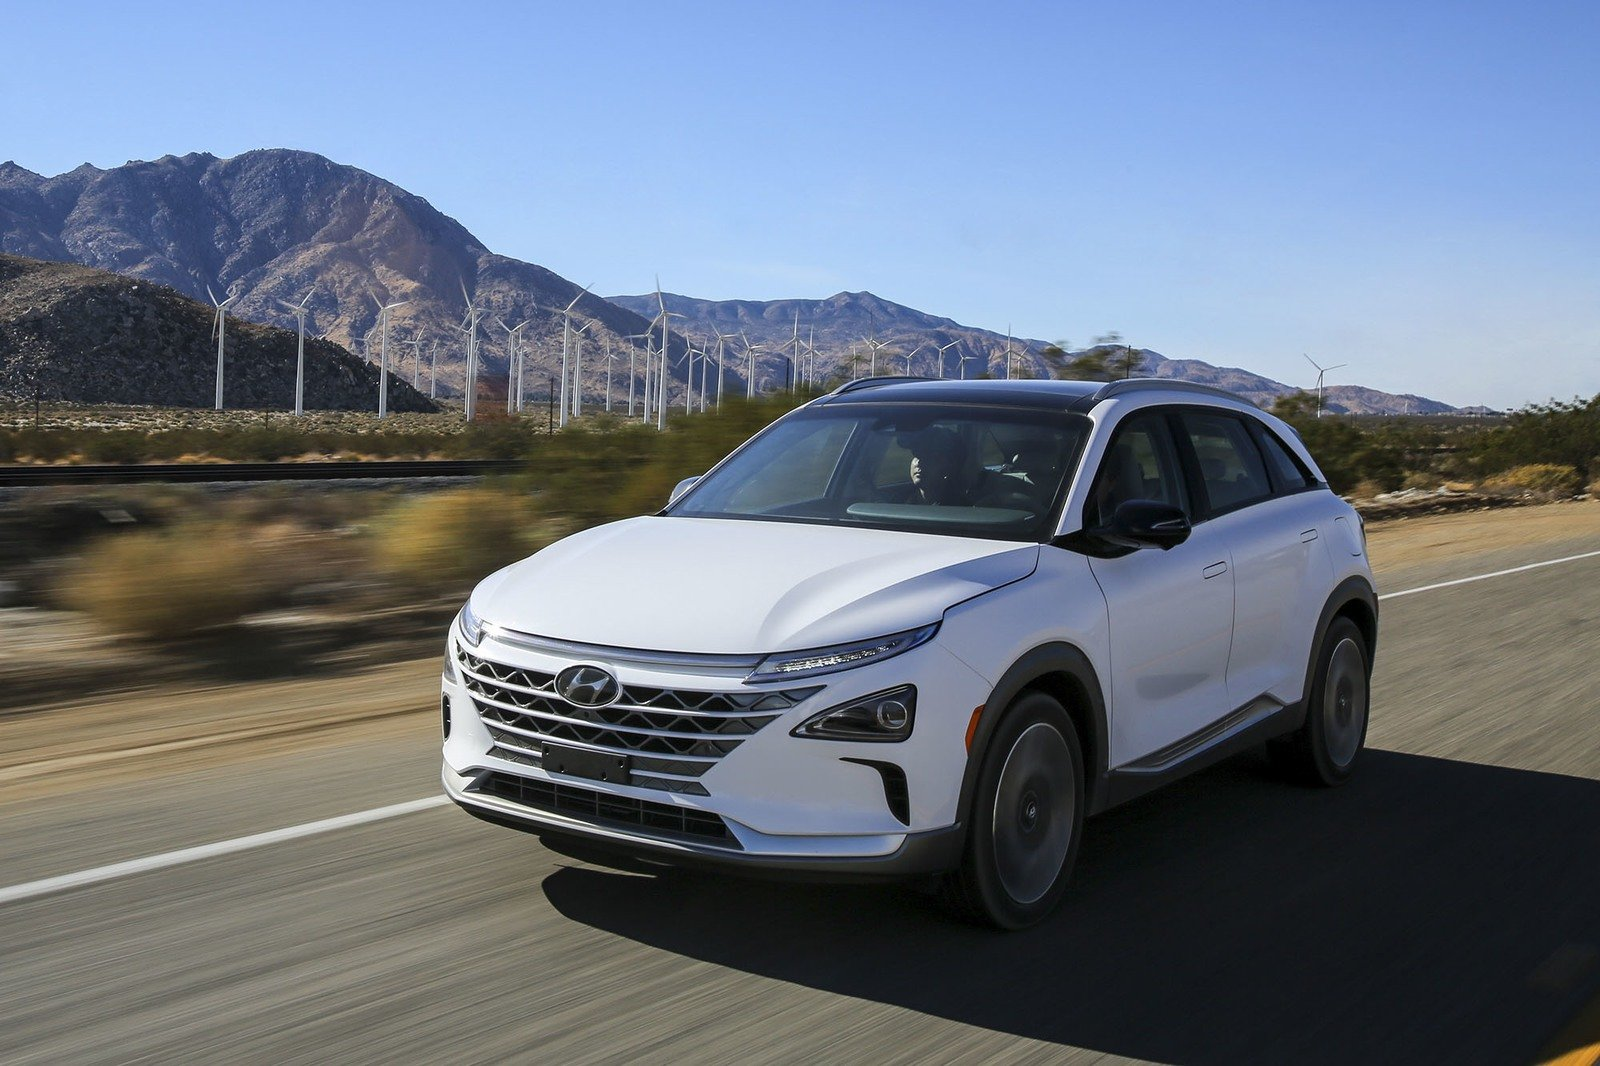 2019 Hyundai Nexo Release Date Price Specs